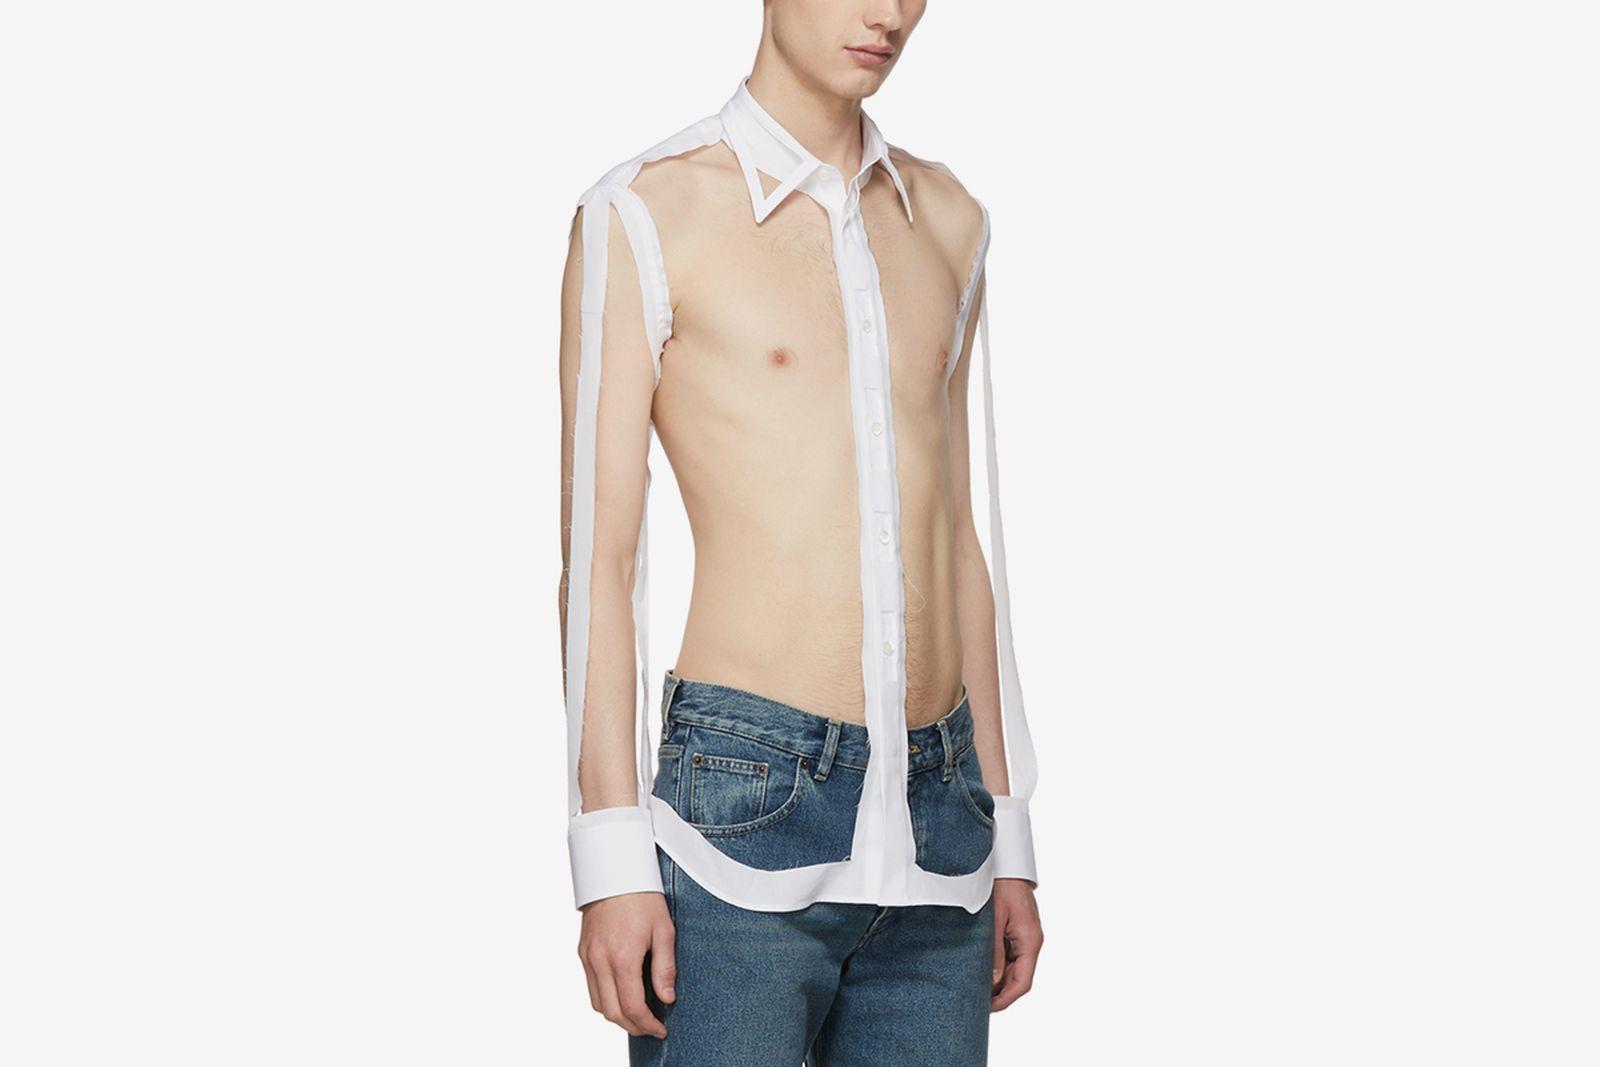 skeleton shirt main Maison Margiela OFF-WHITE c/o Virgil Abloh Replica